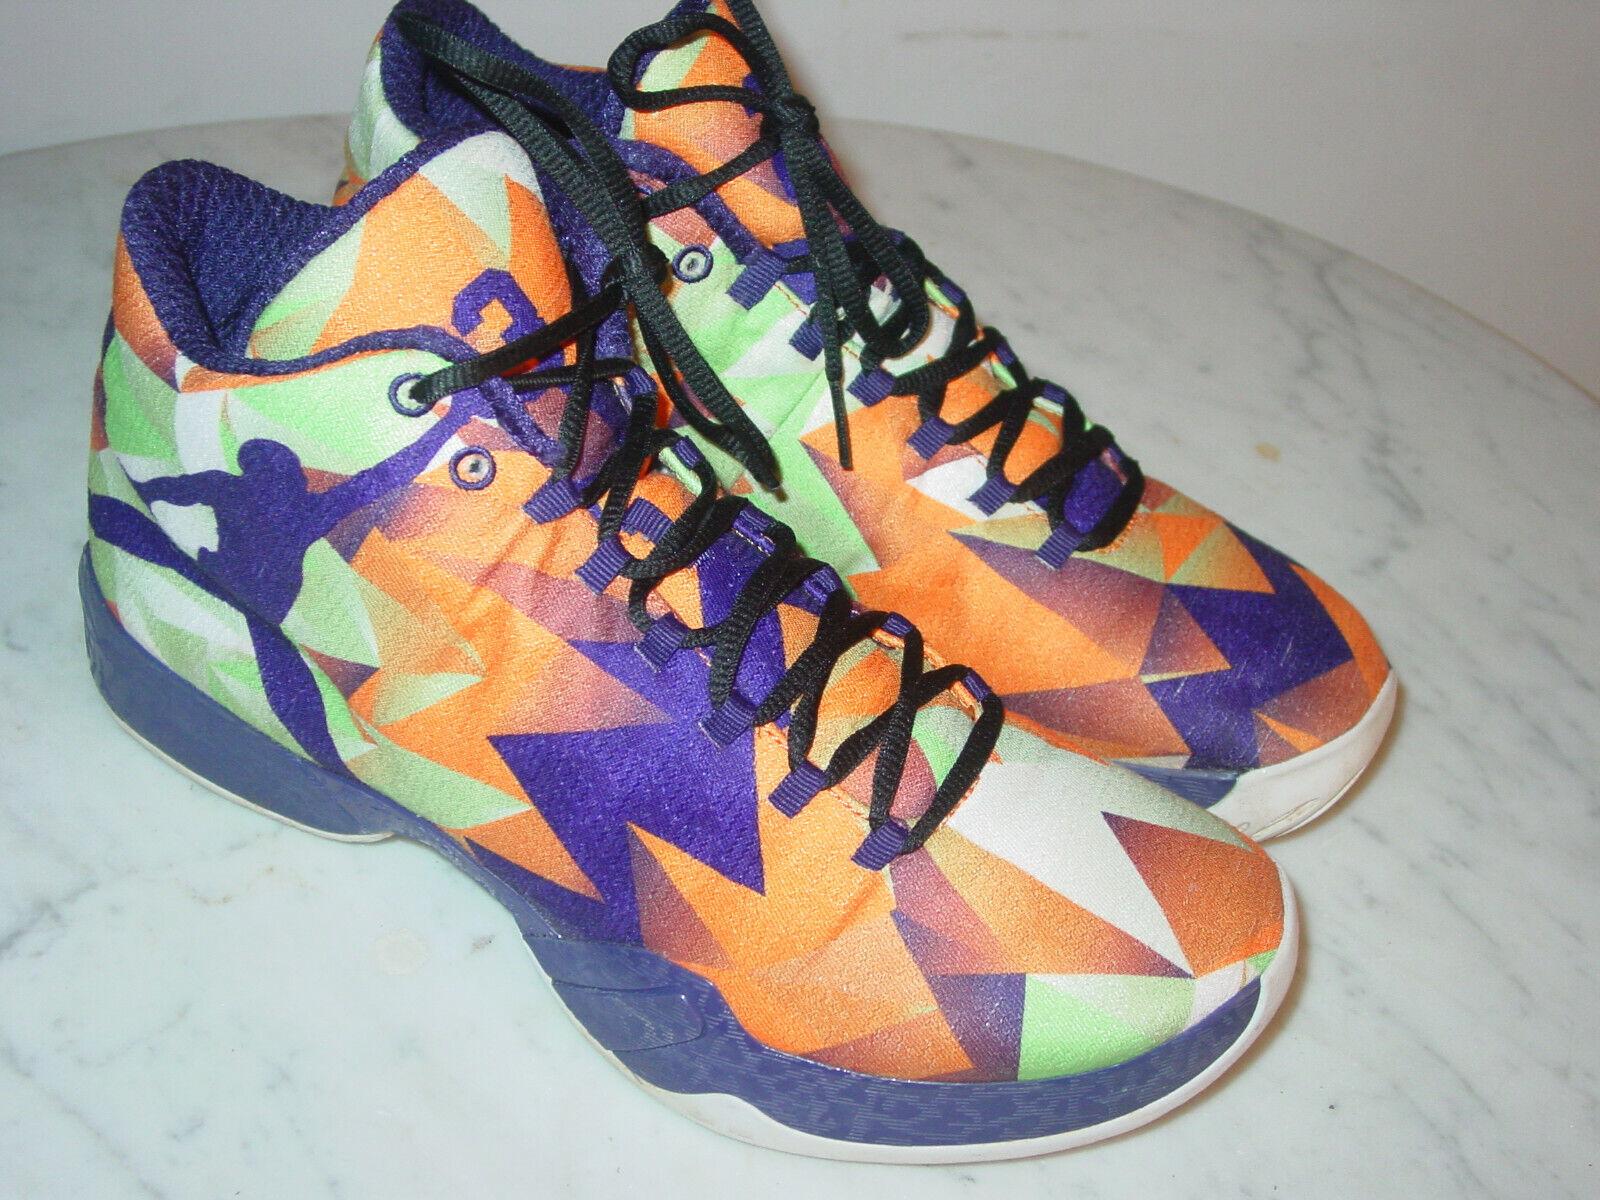 2014 Nike Air Jordan 29  Hare  Bright orange Ink Basketball shoes  Size 10.5